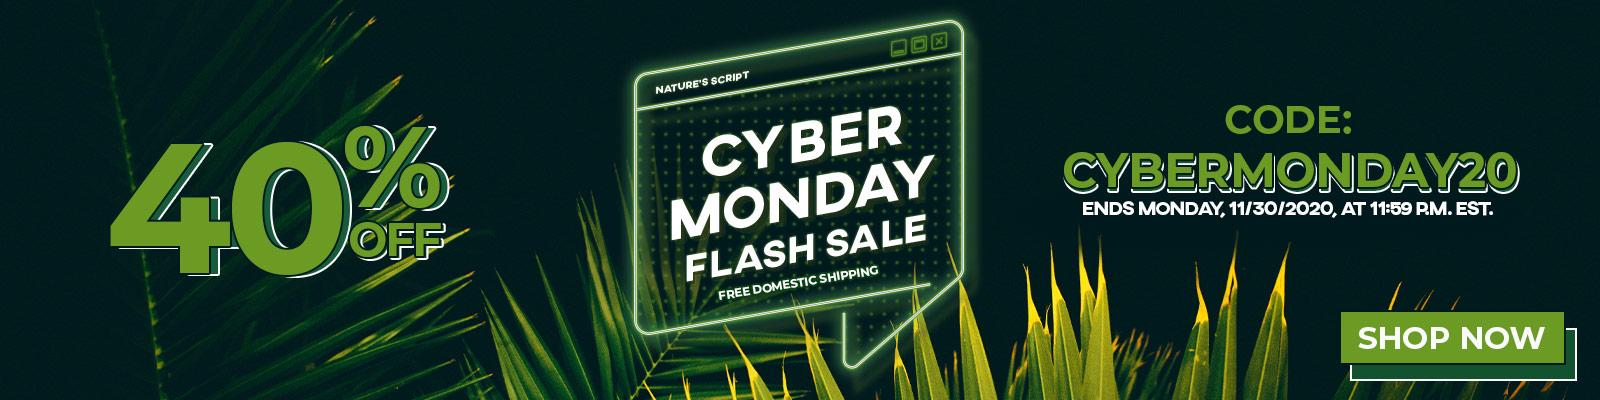 Cyber Monday CBD Products Sale